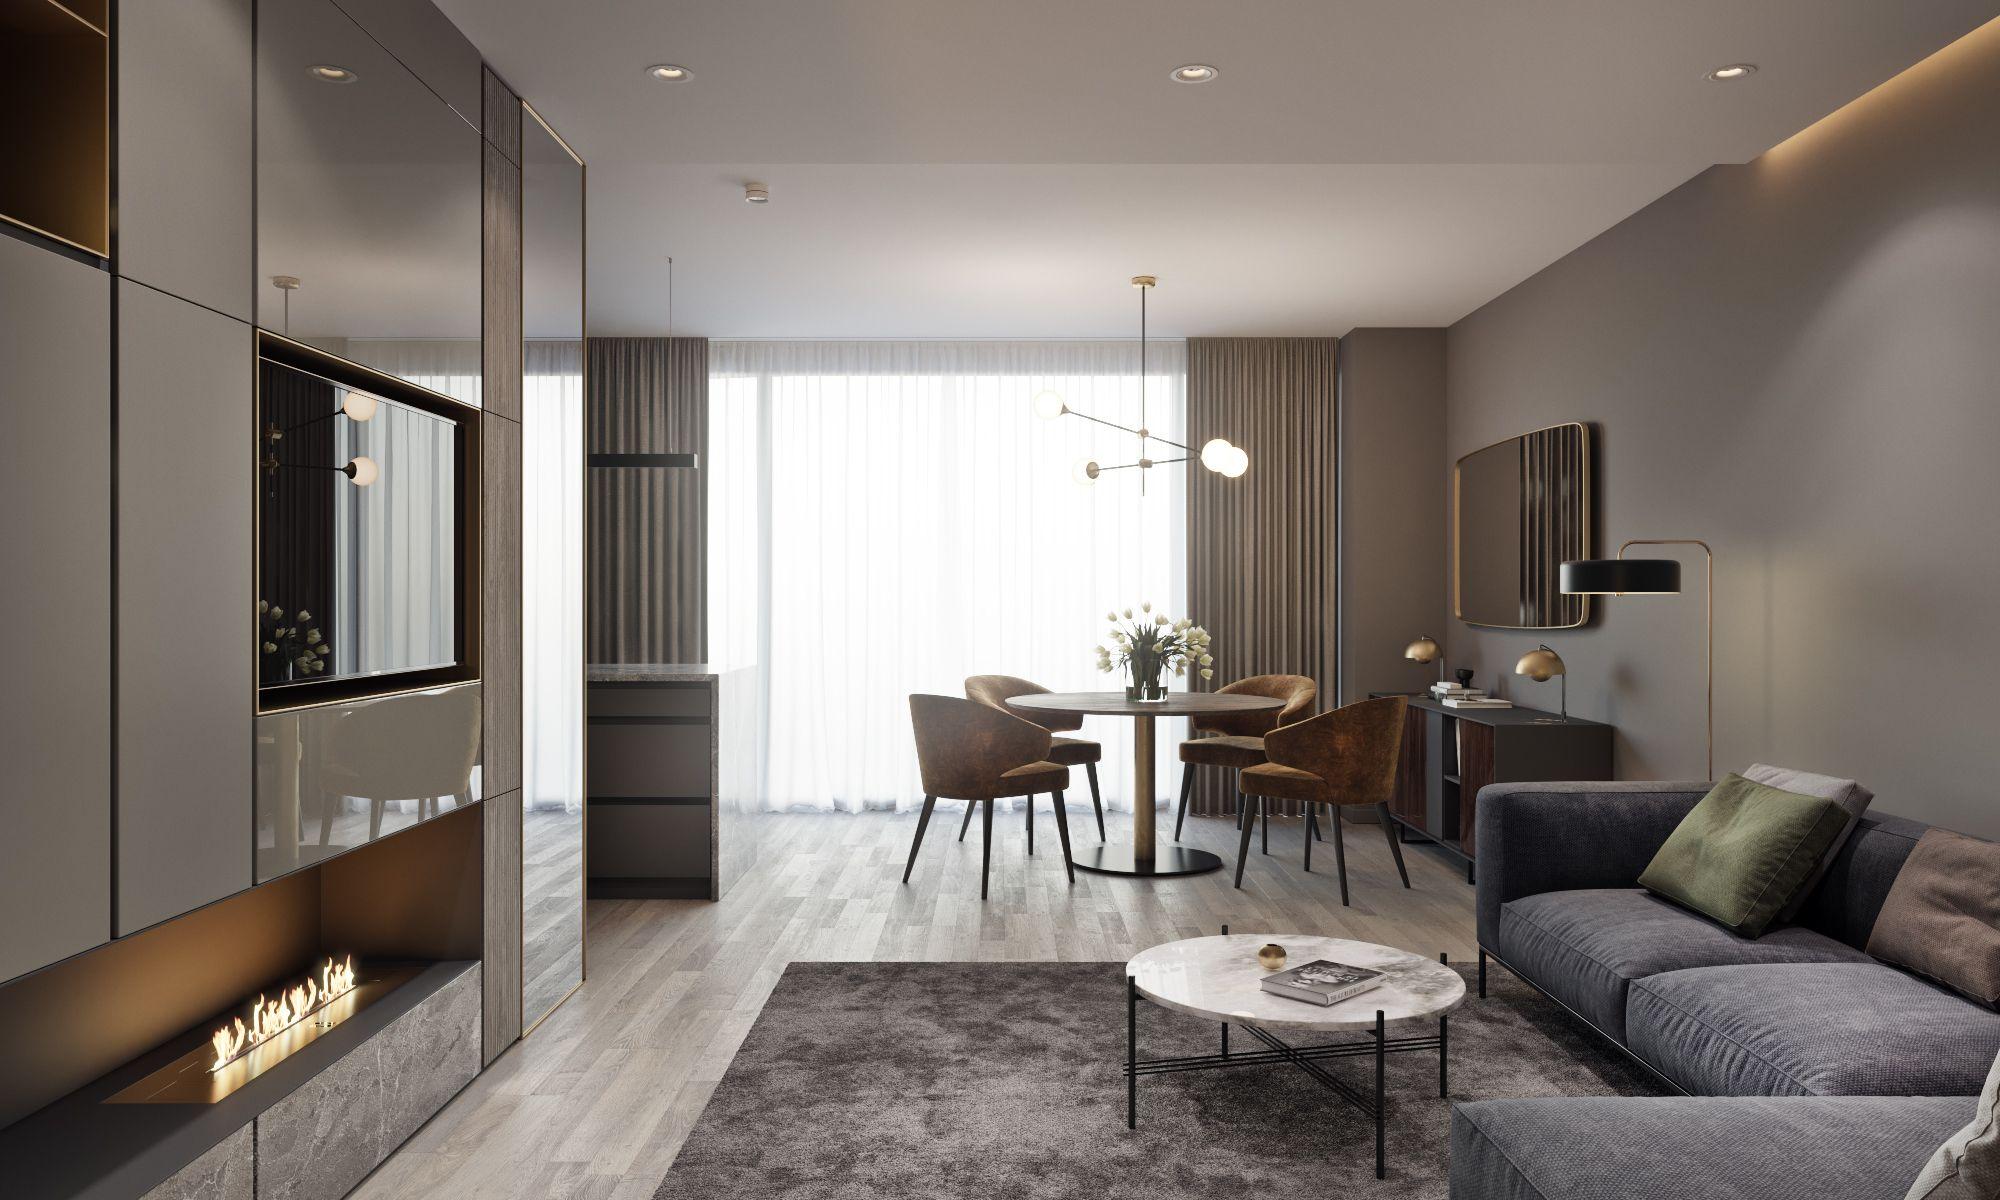 tol 39 ko berlin small apartment in germany on behance can ho landmark 2 vinhomes central. Black Bedroom Furniture Sets. Home Design Ideas